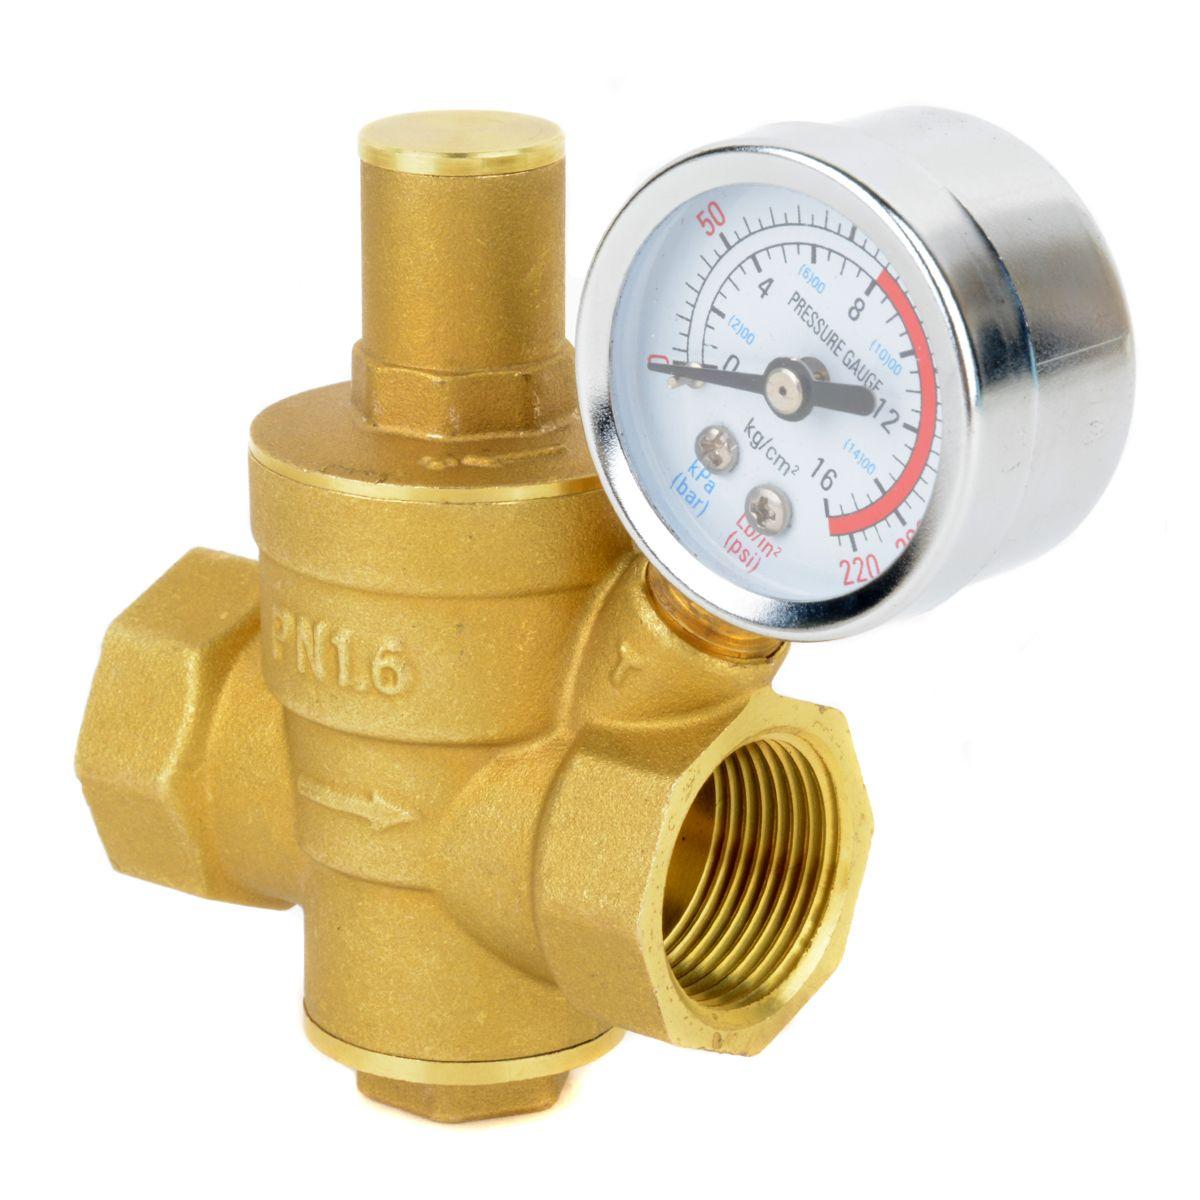 DN20 3/4 Brass Water Pressure Reducing Maintaining Valves <font><b>Regulator</b></font> Mayitr Adjustable Relief Valves With Gauge Meter 85*63mm